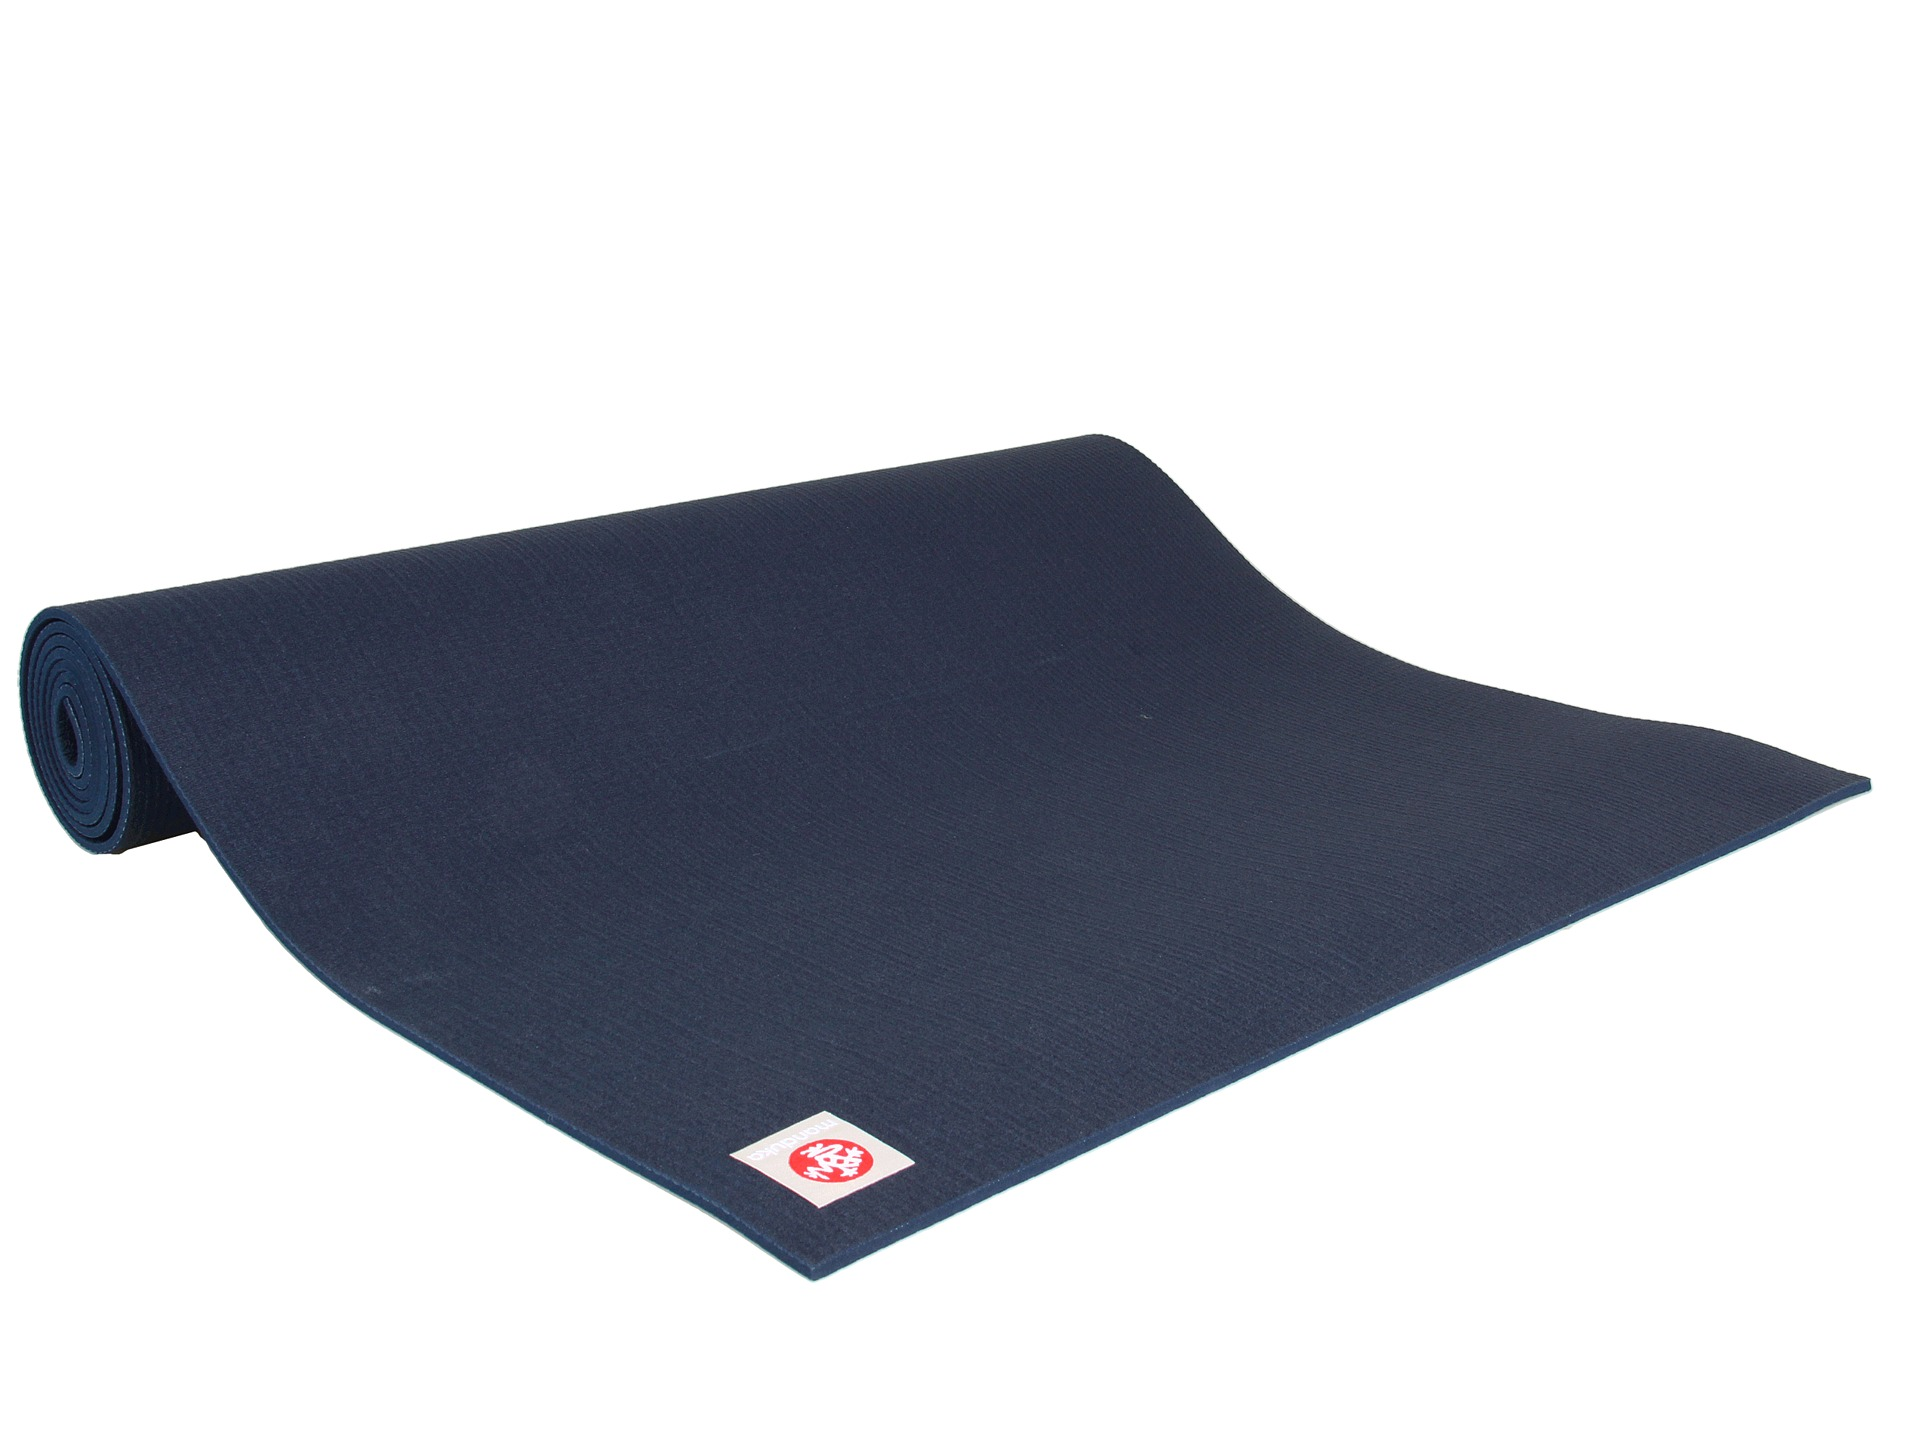 Manduka Prolite Yoga Mat At Zappos Com